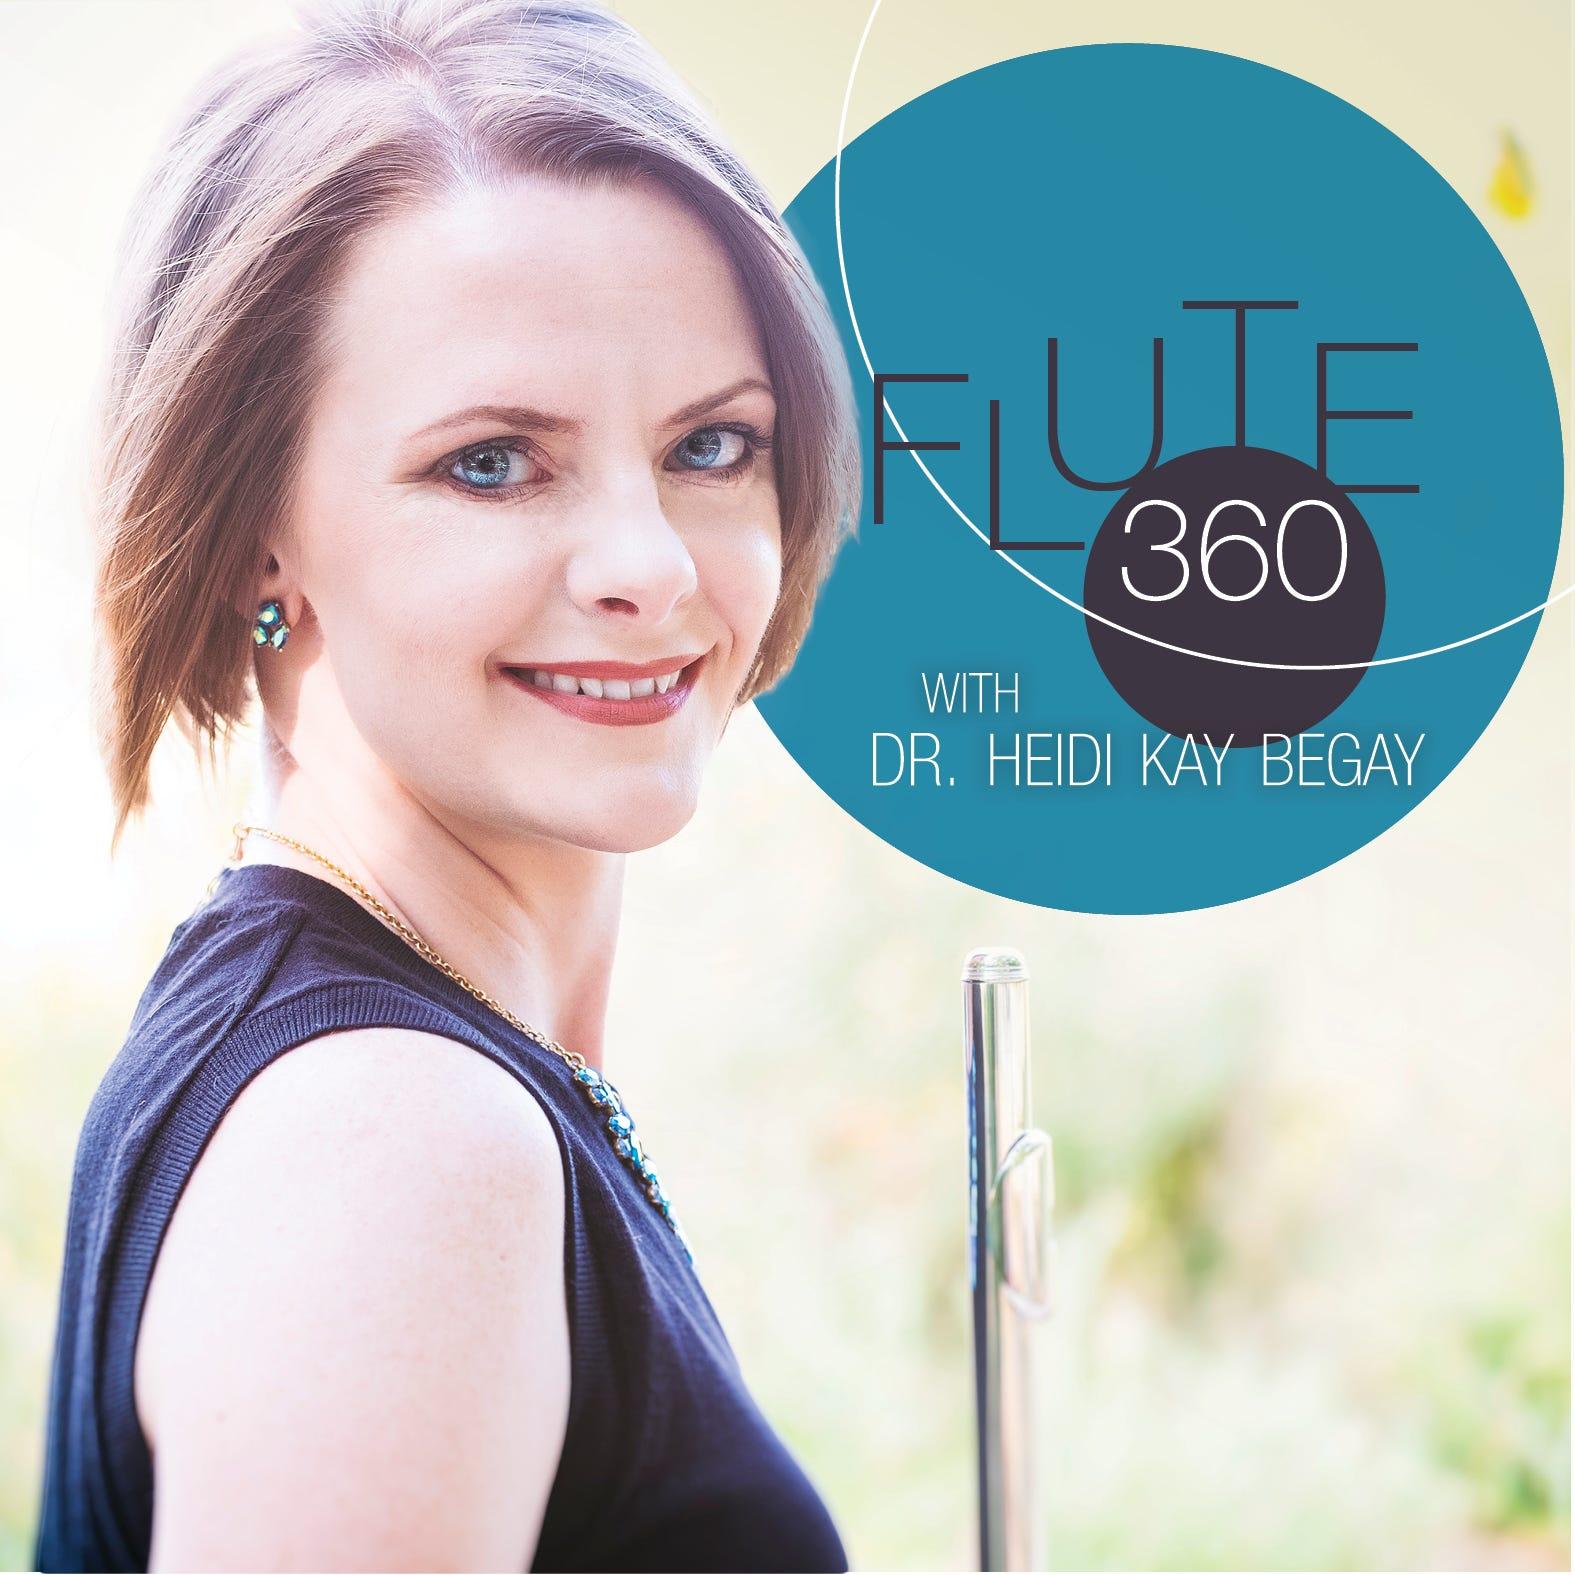 Flute 360